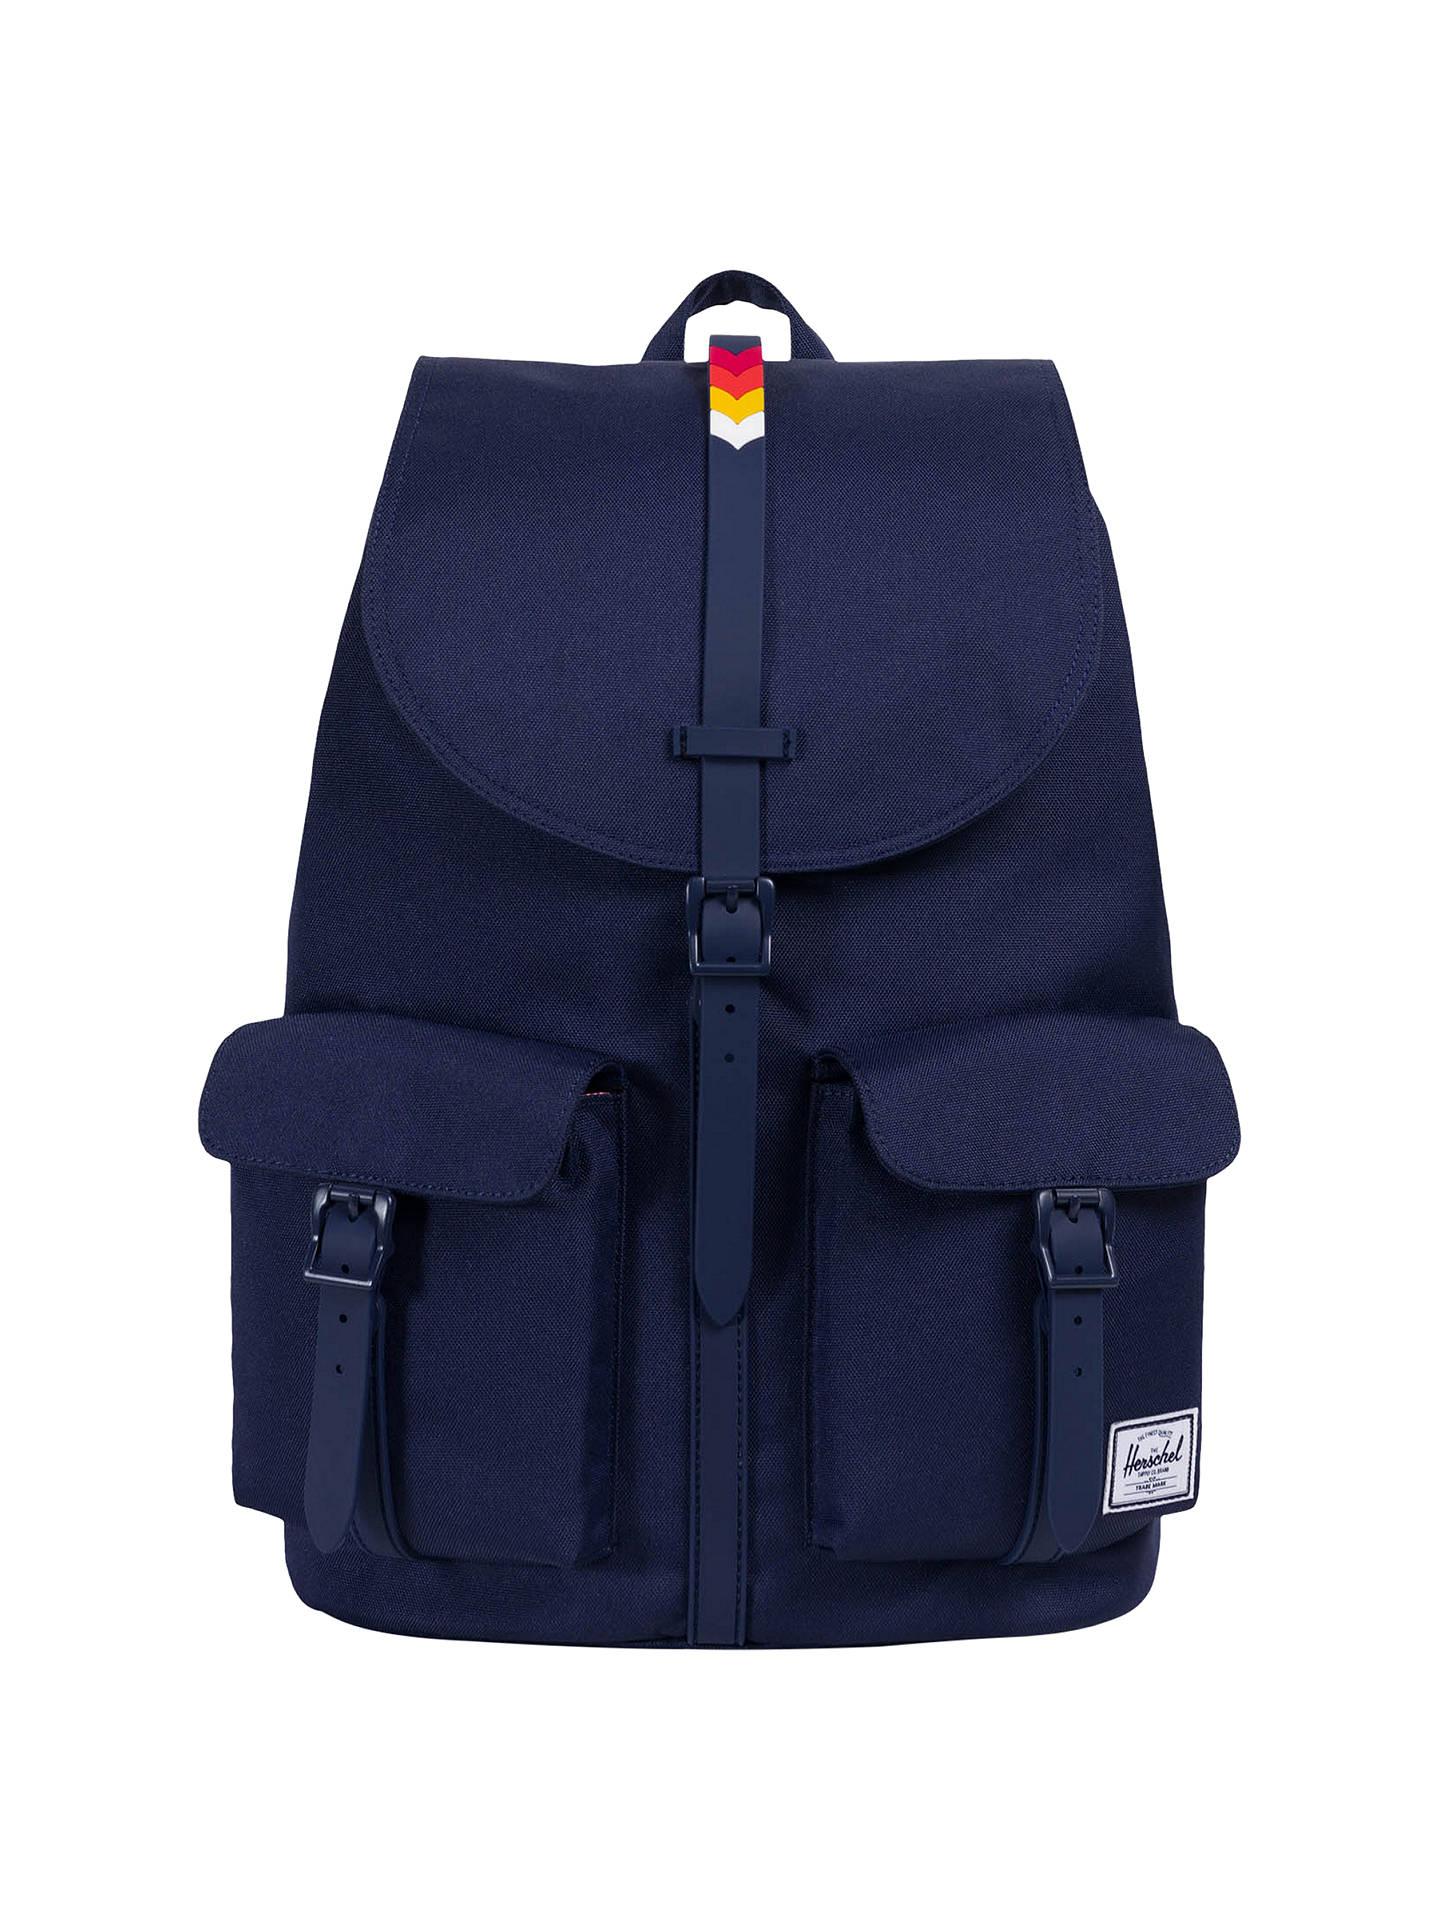 bab85e719 Buy Herschel Supply Co. Dawson Backpack, Blue Online at johnlewis.com ...